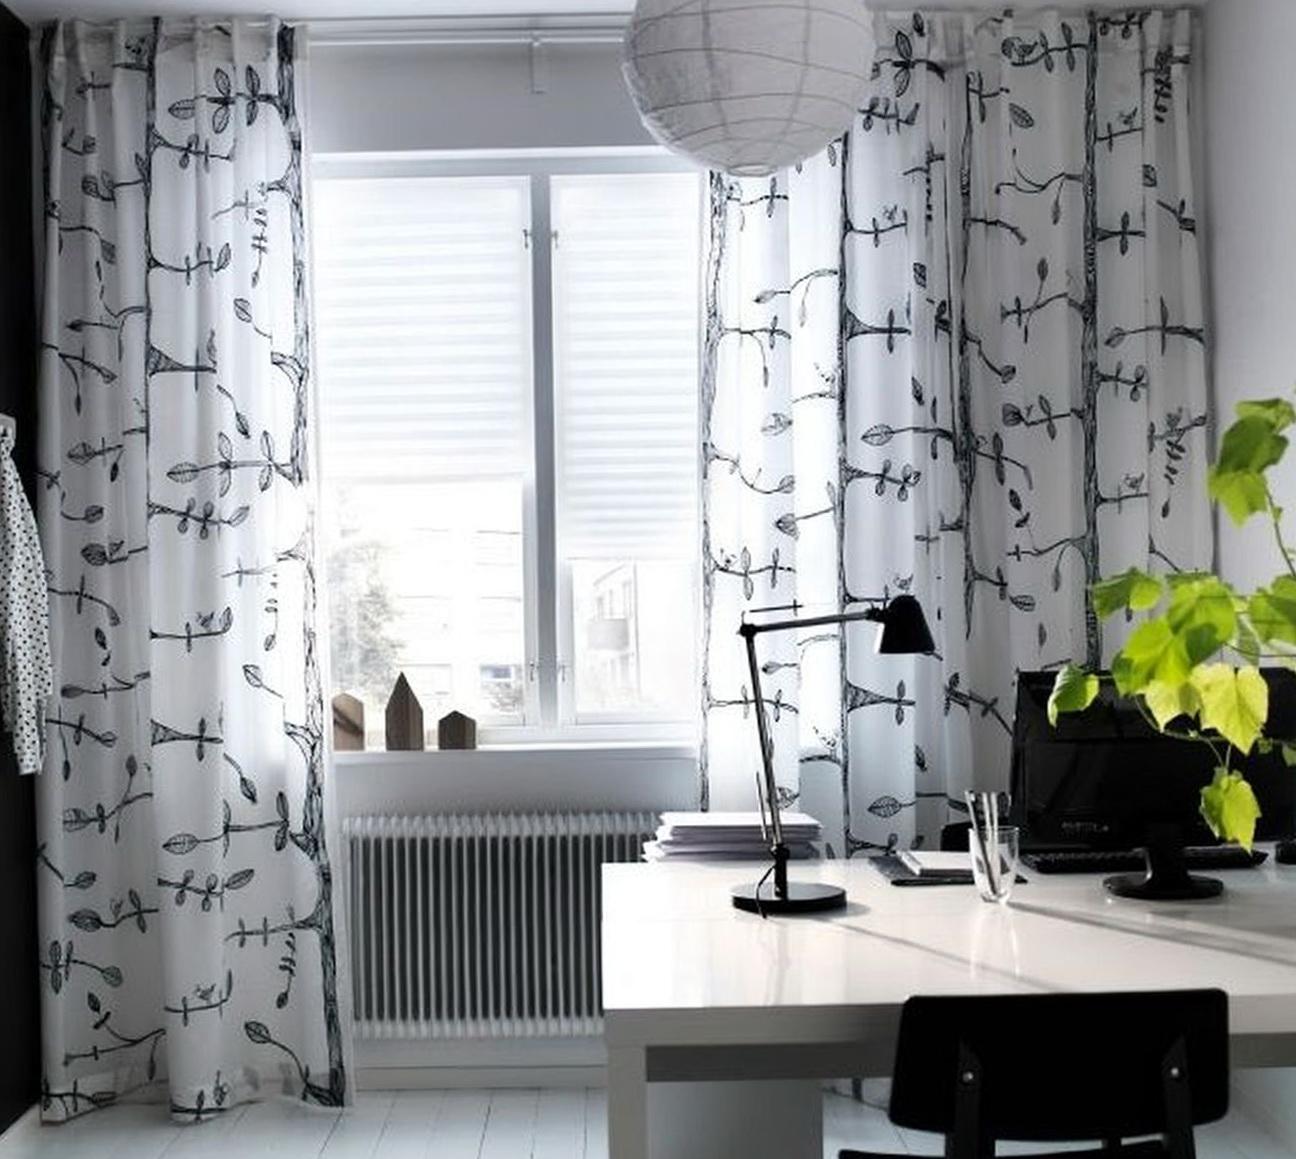 Ikea Curtains Black And White Home Design Ideas